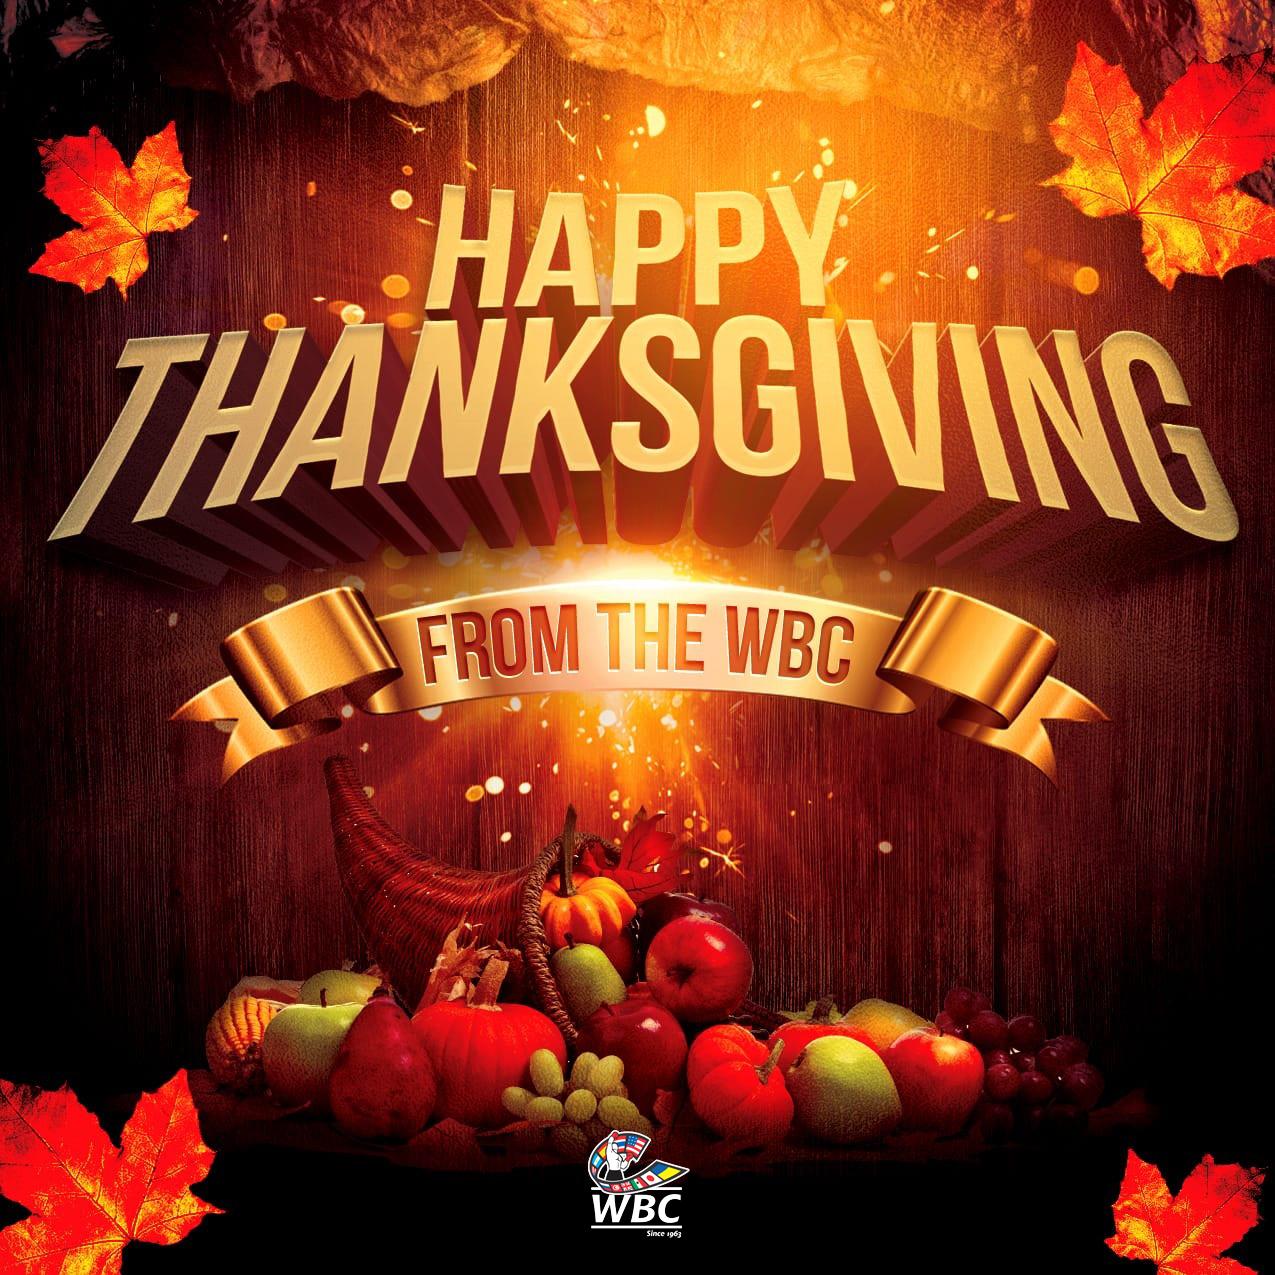 https://suljosblog.com/suljos/wp-content/uploads/2018/11/thanksgiving-2018-.jpg